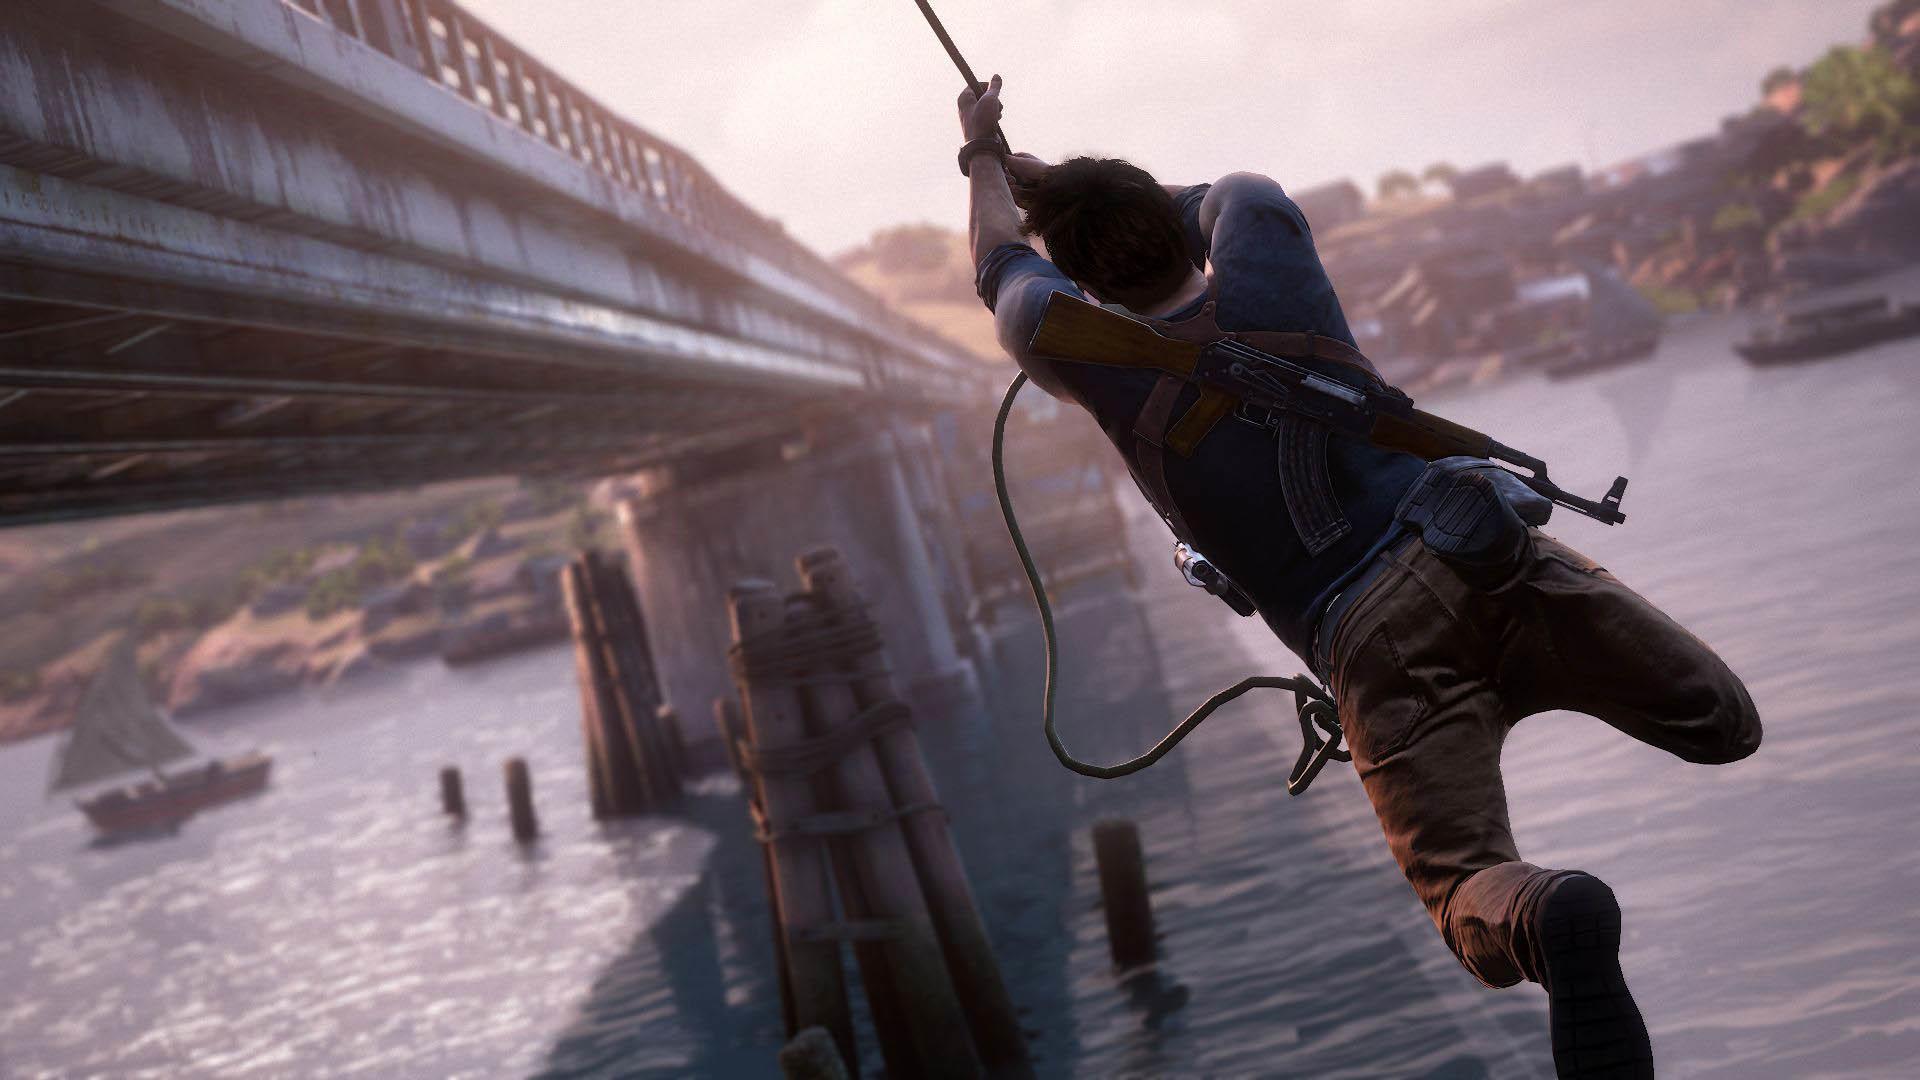 Uncharted 4: A Thief's End – Tarzan Jump next to a Bridge  wallpaper